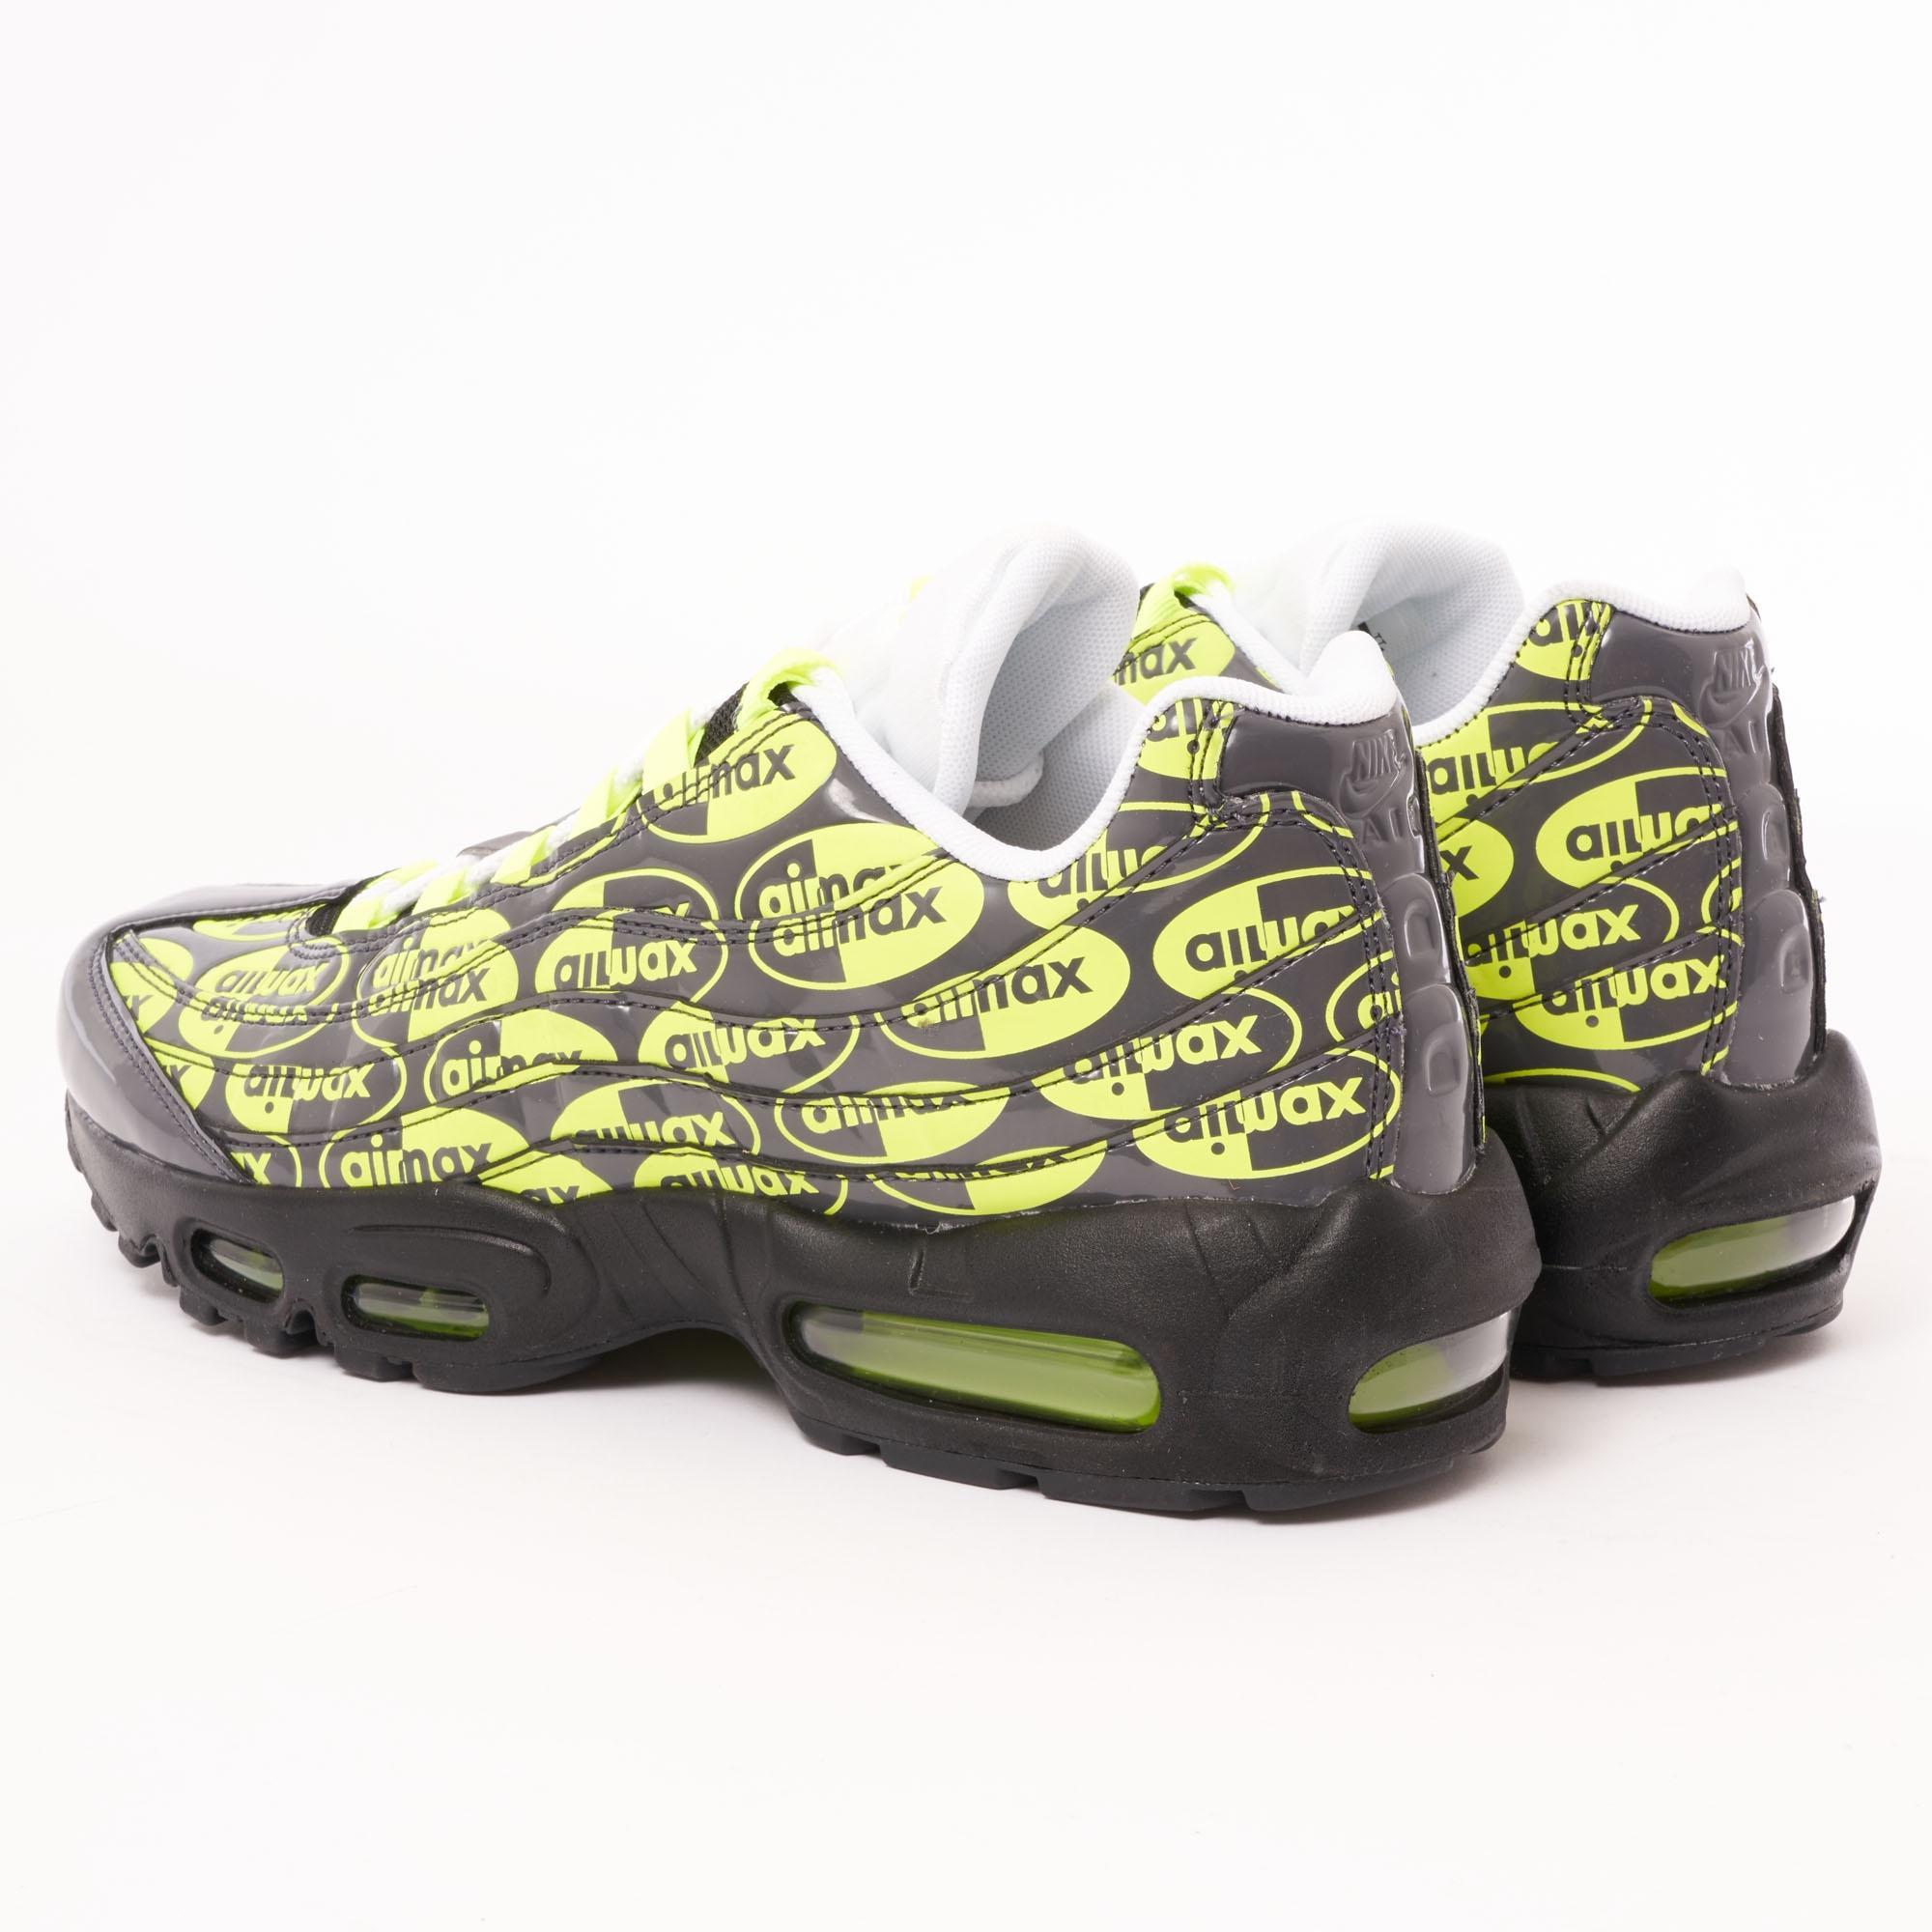 best sneakers 01fe8 34730 http://civilize.speakerphonerecords.com/14/czqxc/kern ...